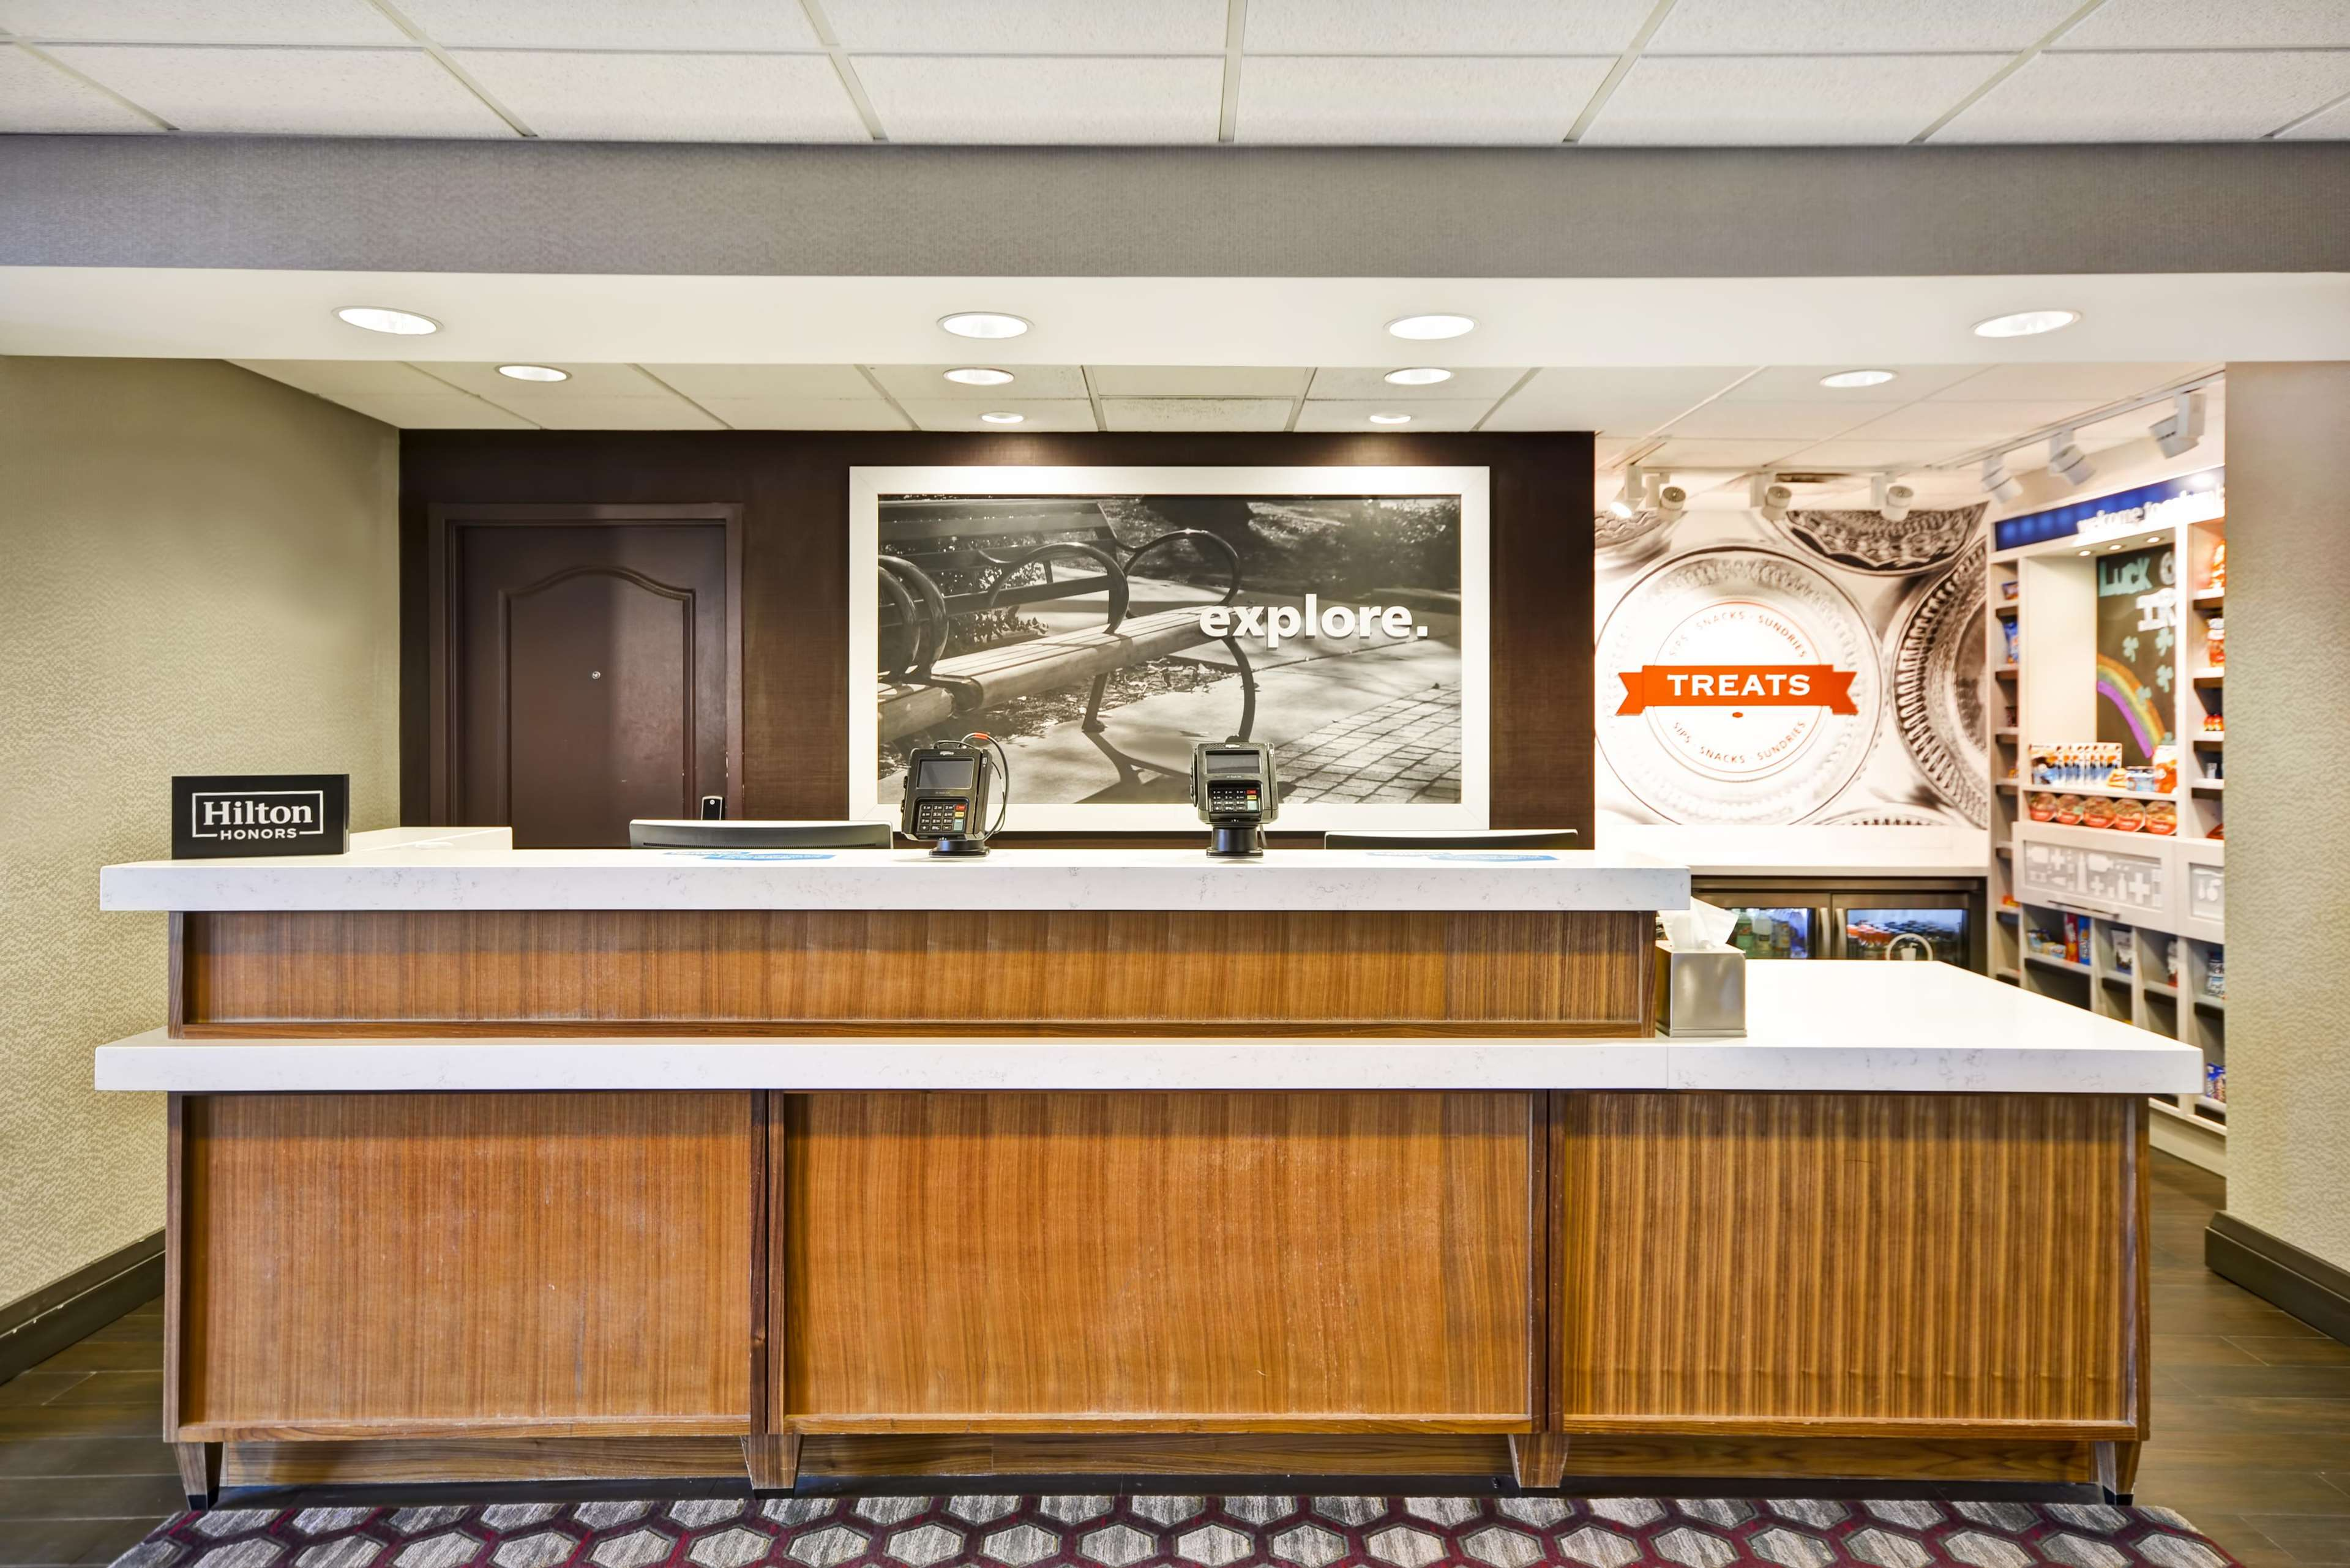 Hampton Inn & Suites Columbus-Easton Area image 7